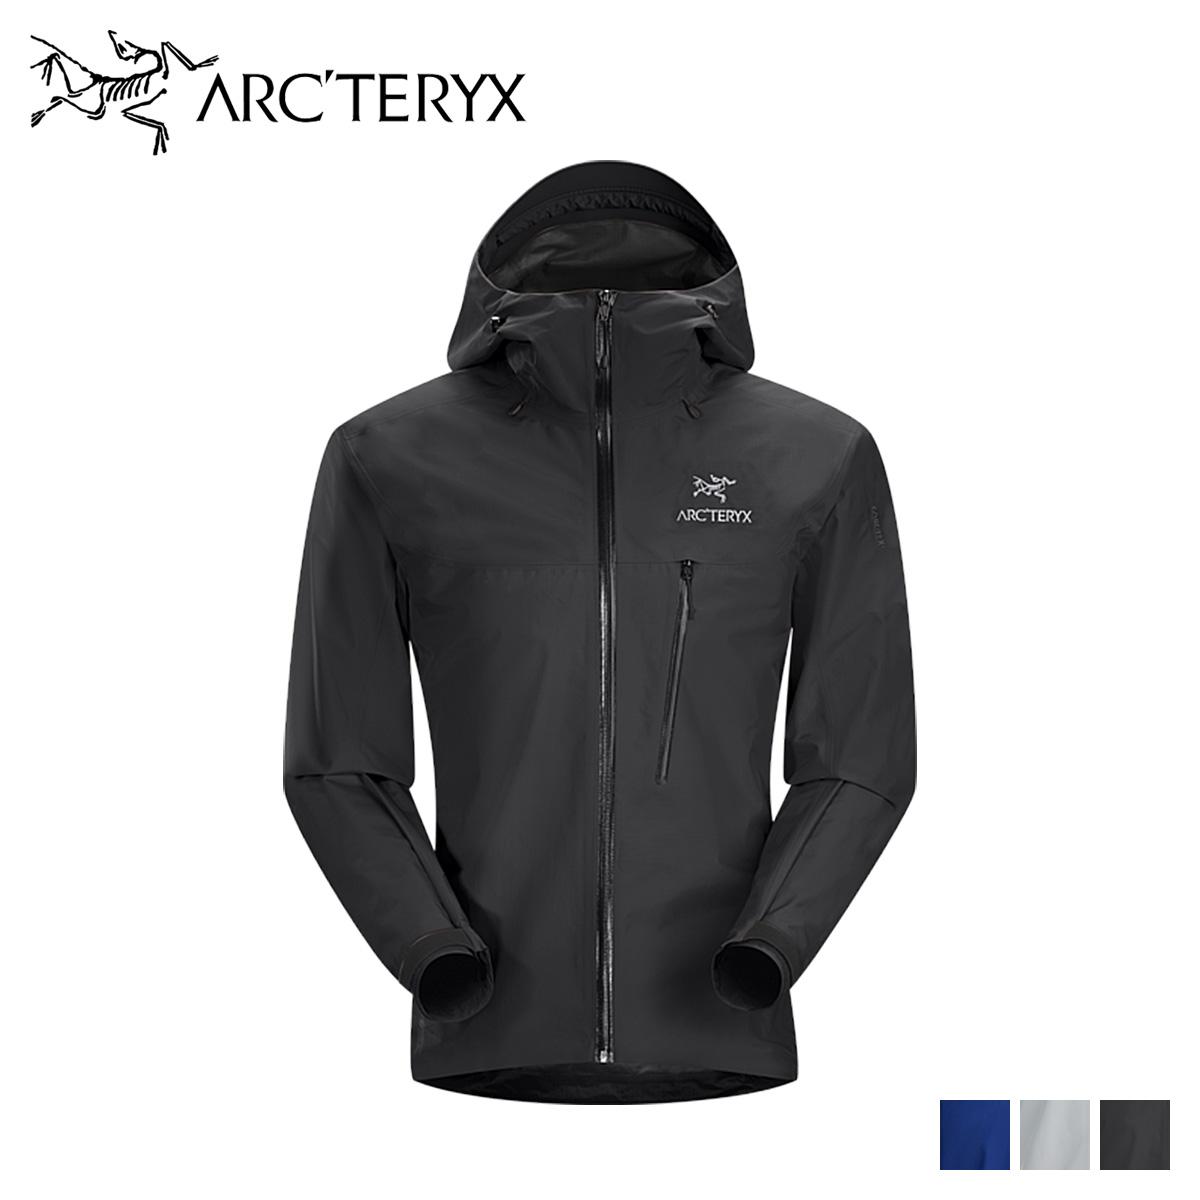 ARC'TERYX アークテリクス ジャケット アルファ ALPHA SL JACKET メンズ ブラック 黒 グレー ブルー 15179